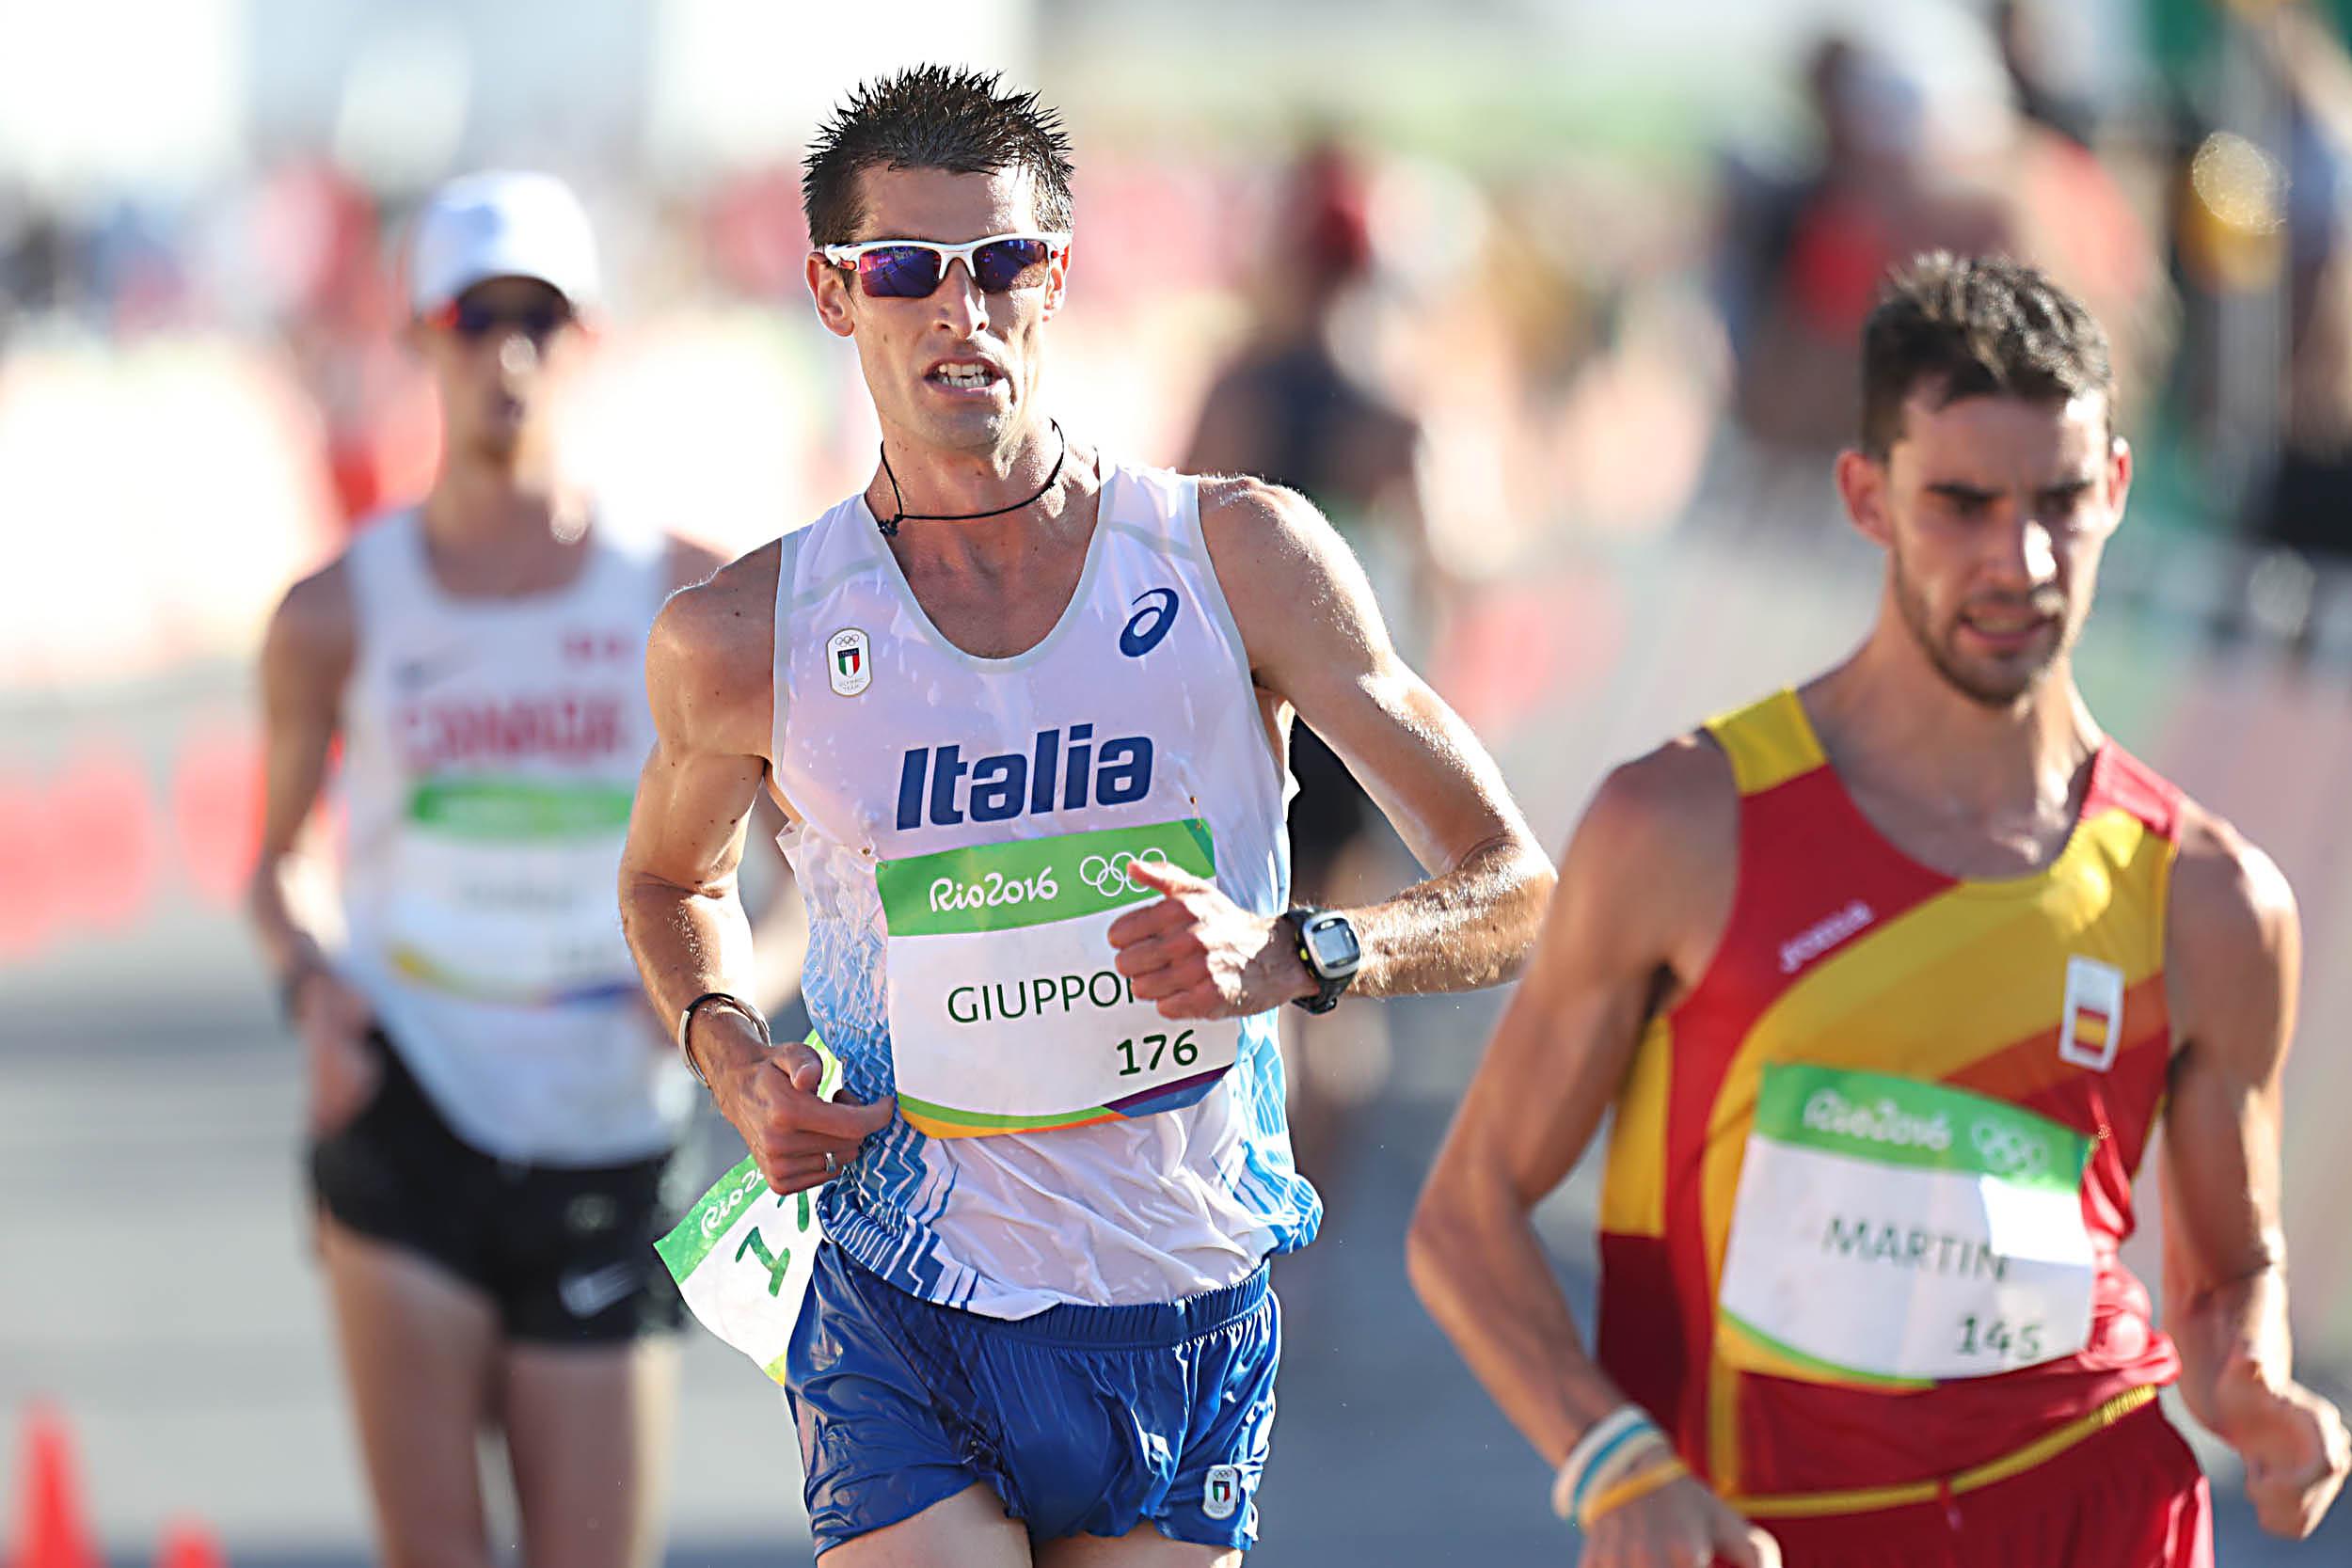 05bb51c059515 Olimpiadi Rio 2016 Marcia 20Km Uomini - Marcia.it